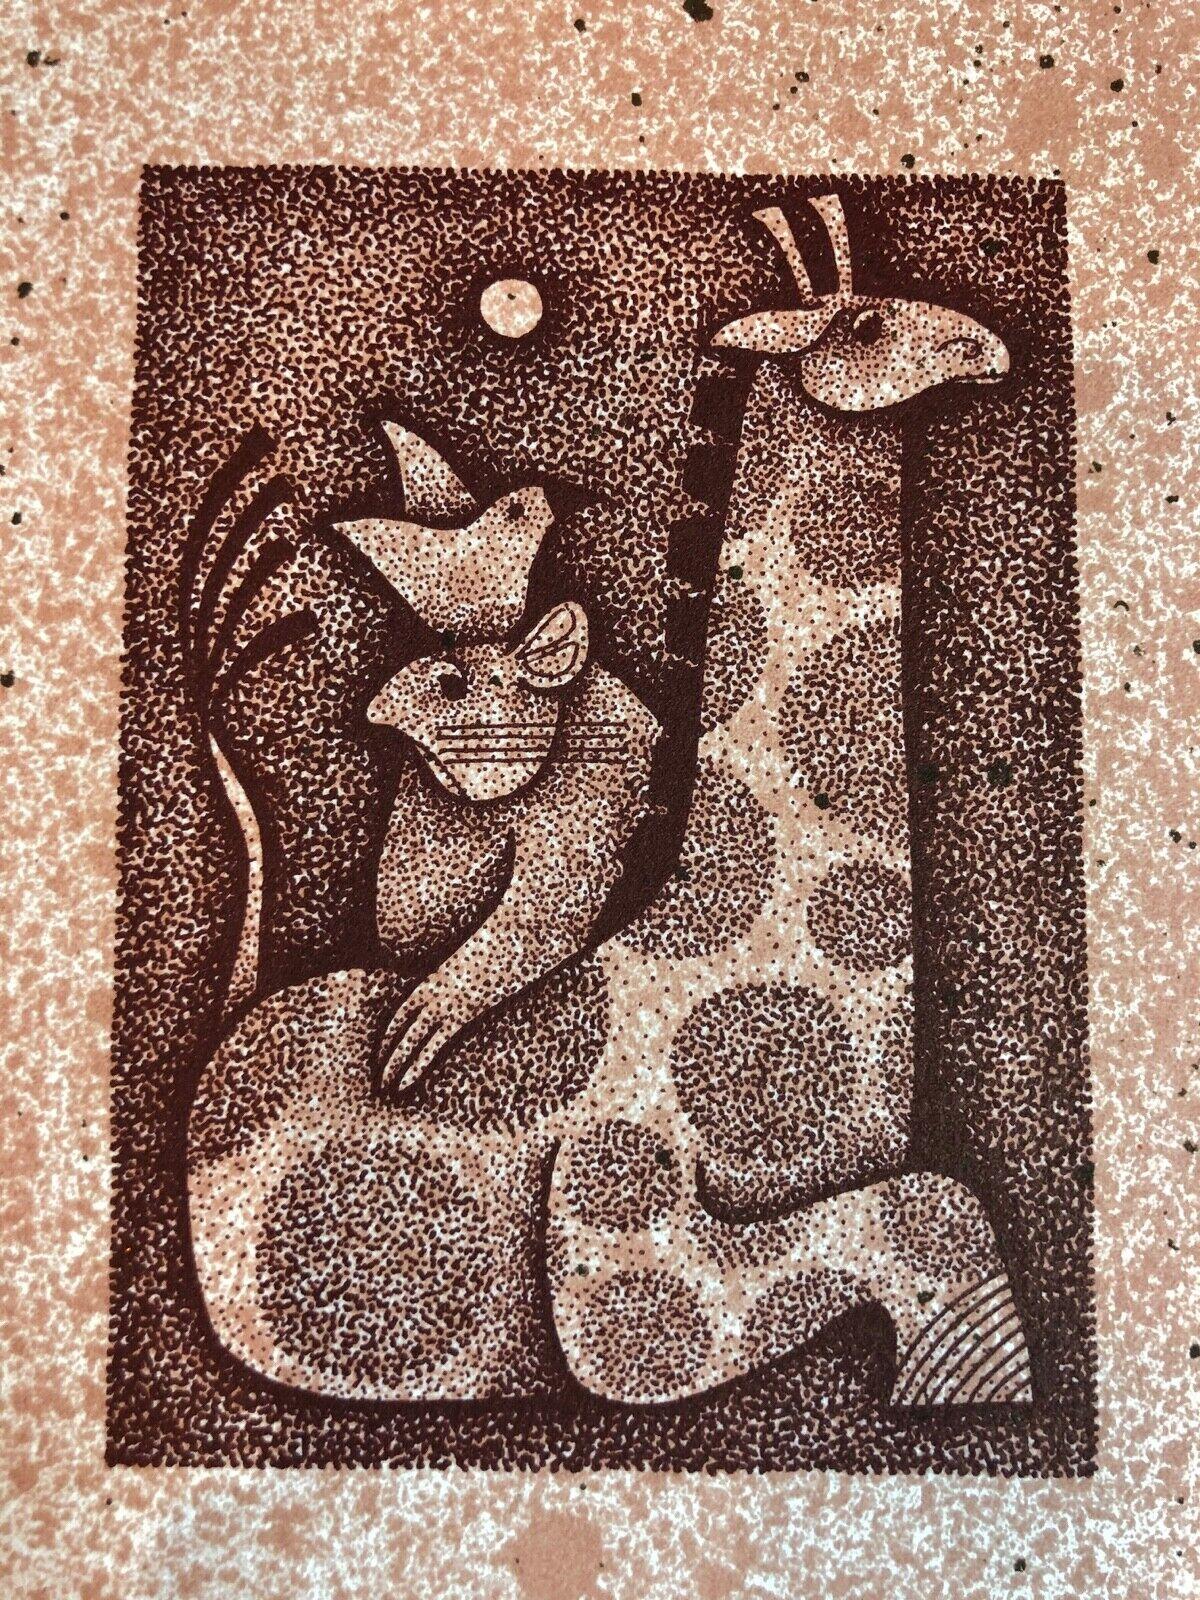 Carol Jablonsky Lithograph Art Print – Circus Enter Limited Edition 152/250 Art